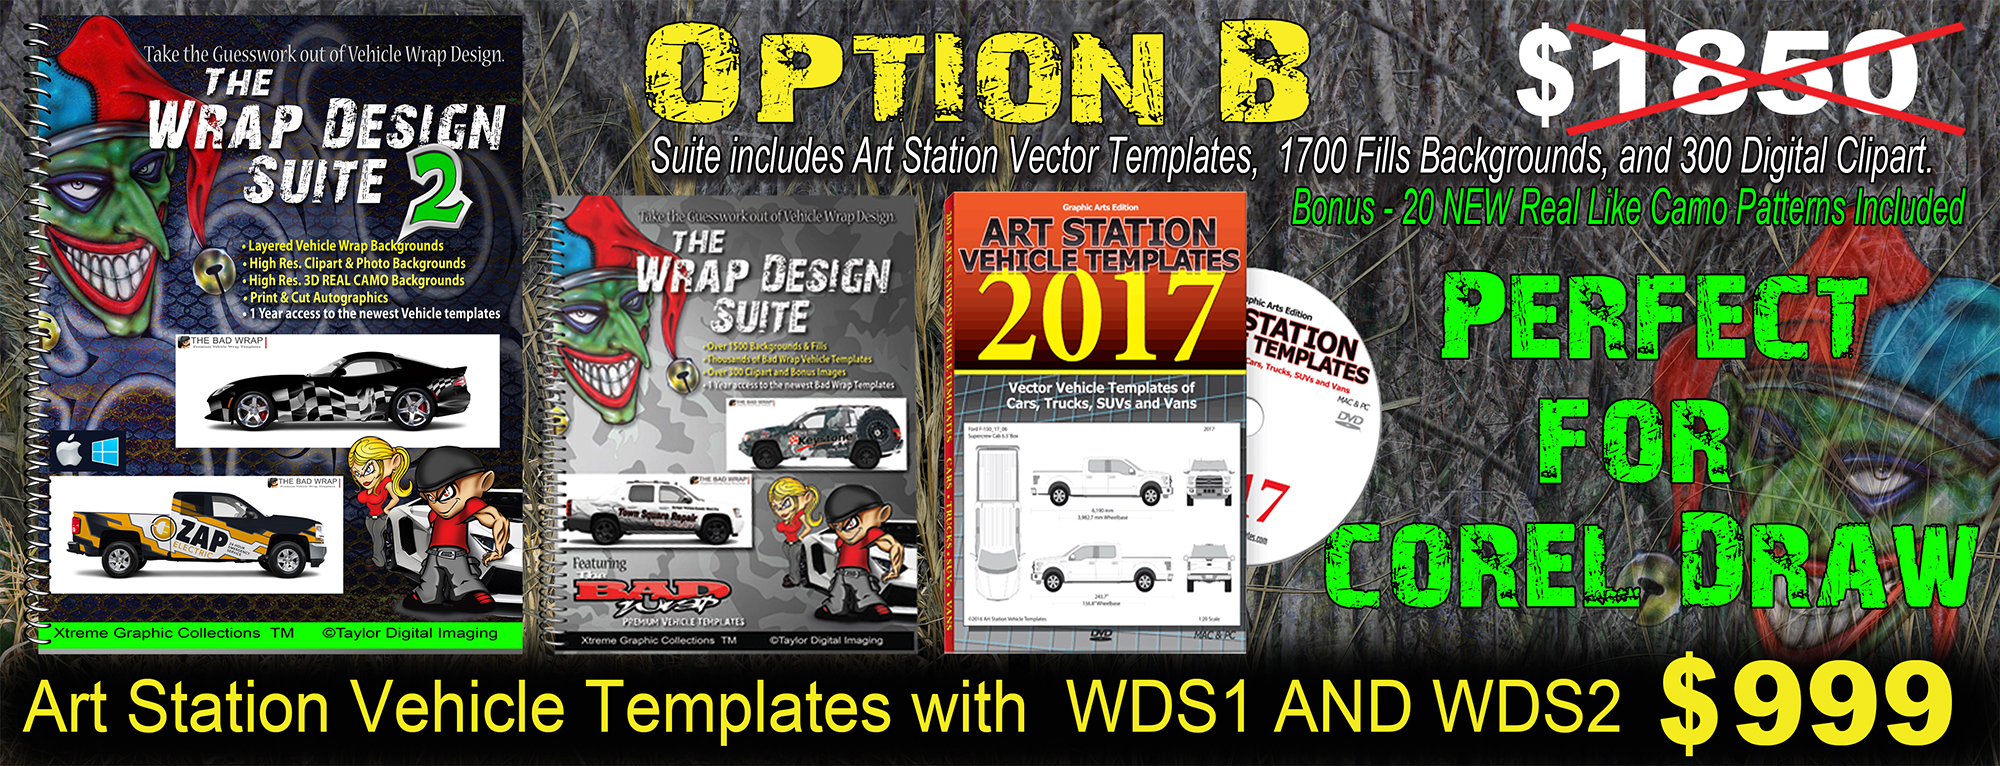 Option B 2017